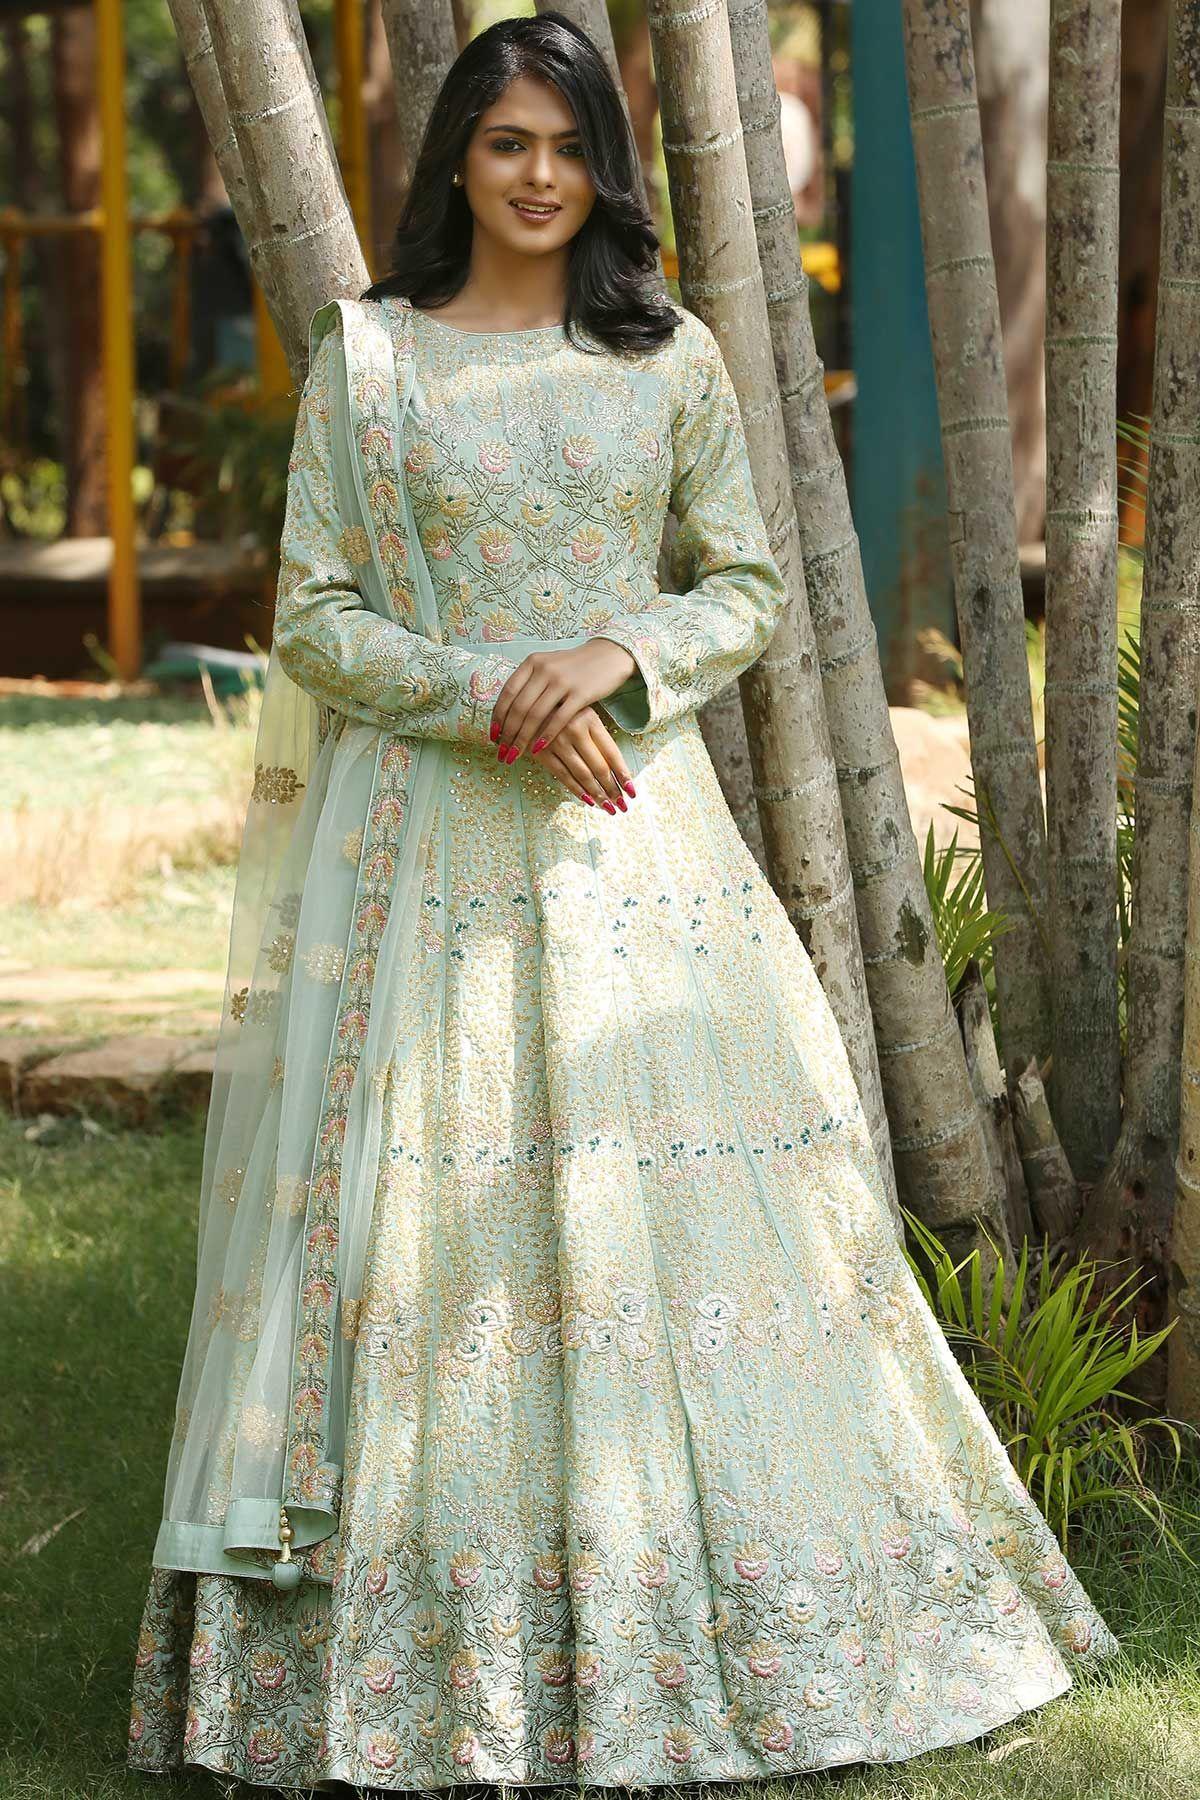 94c555319d Buy Light Green Zardosi Embroidered Raw Silk Evening Gown Online